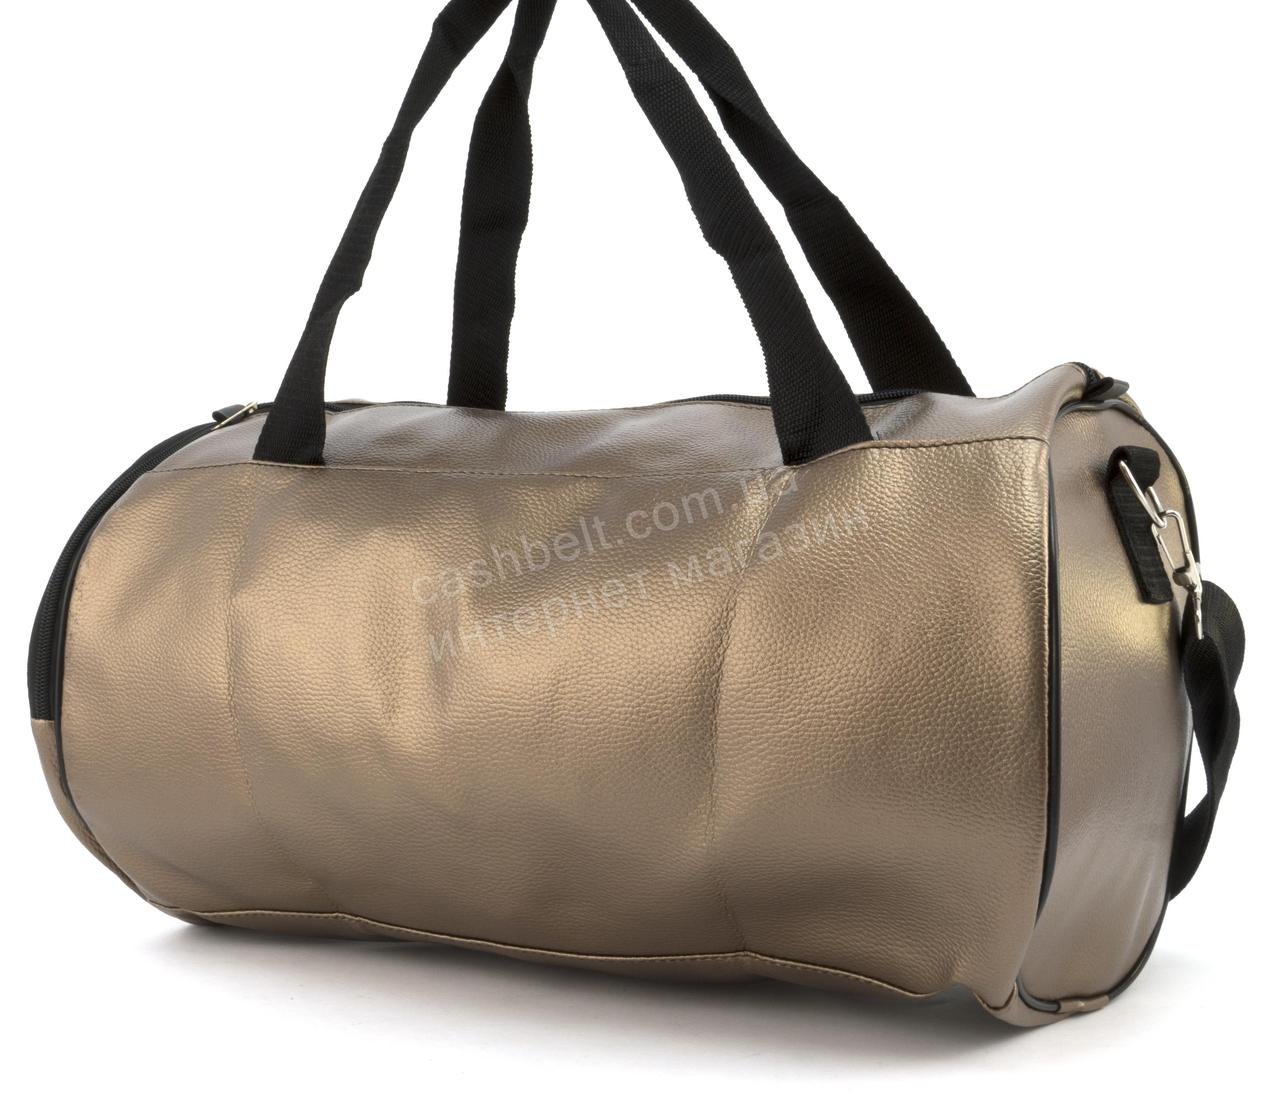 e13fae2b9386 Спортивная женская сумка из эко кожи бочонок art. 418 (102163 ...